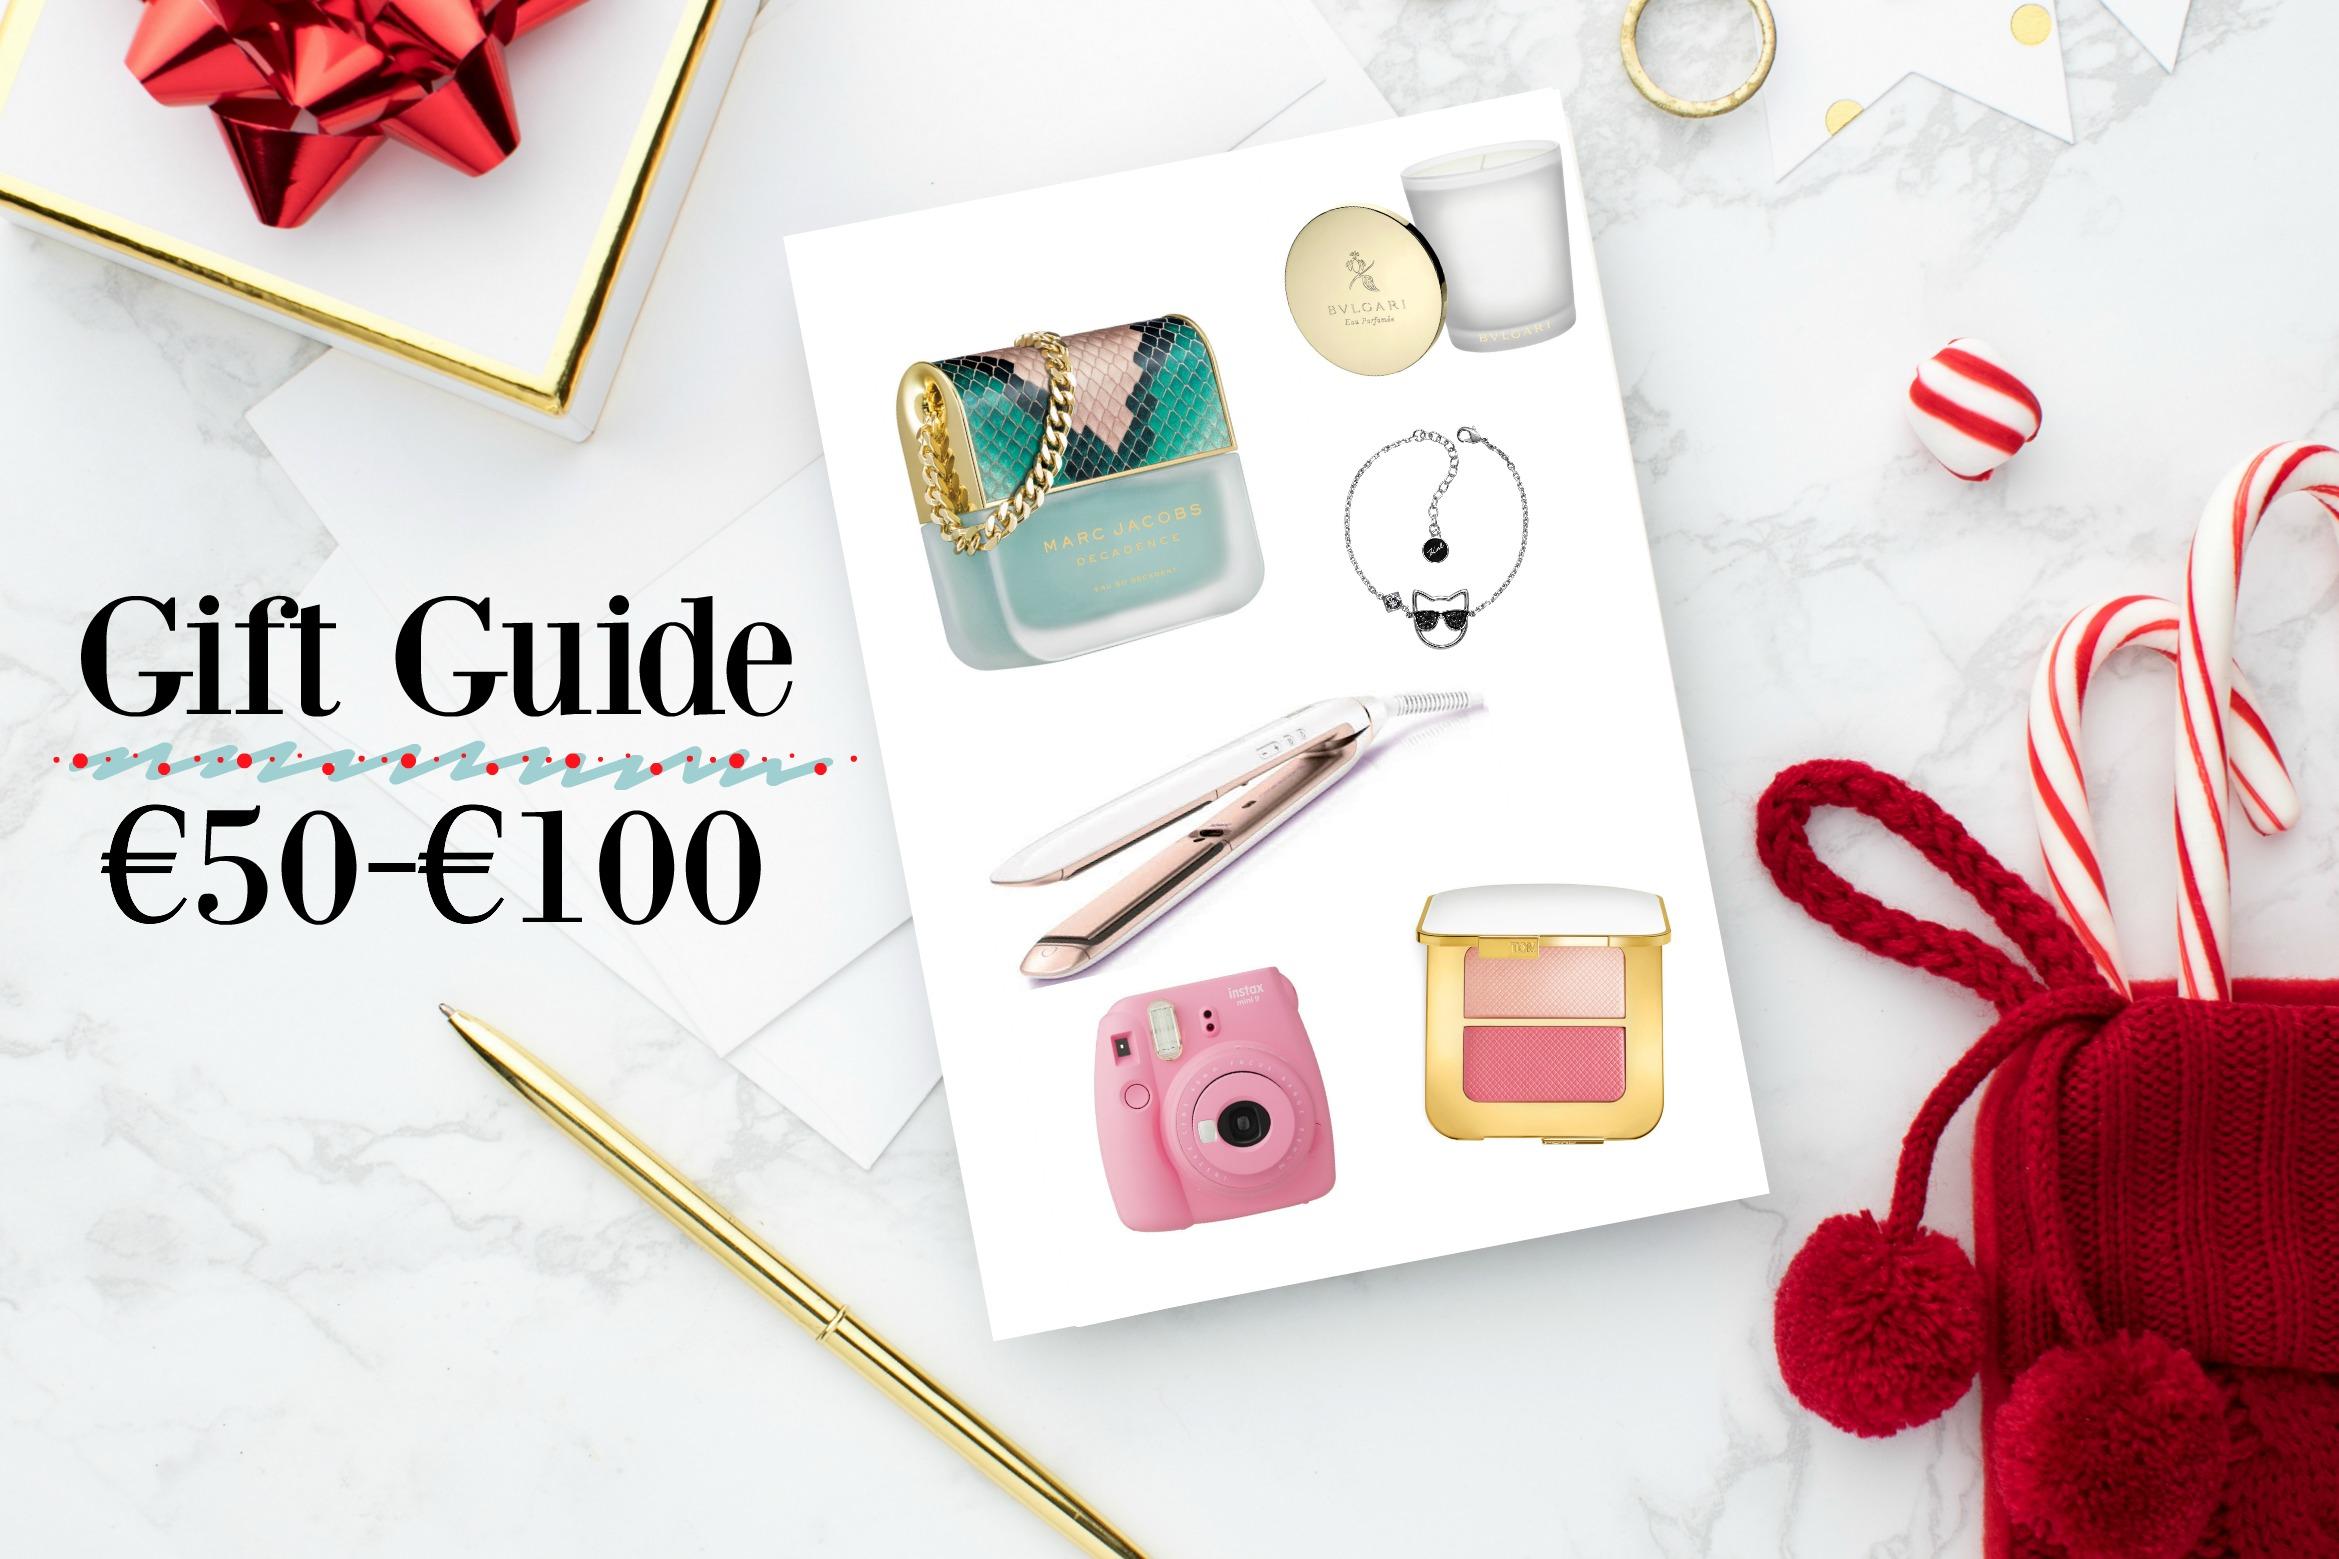 Gift Guide tussen €50 en €100